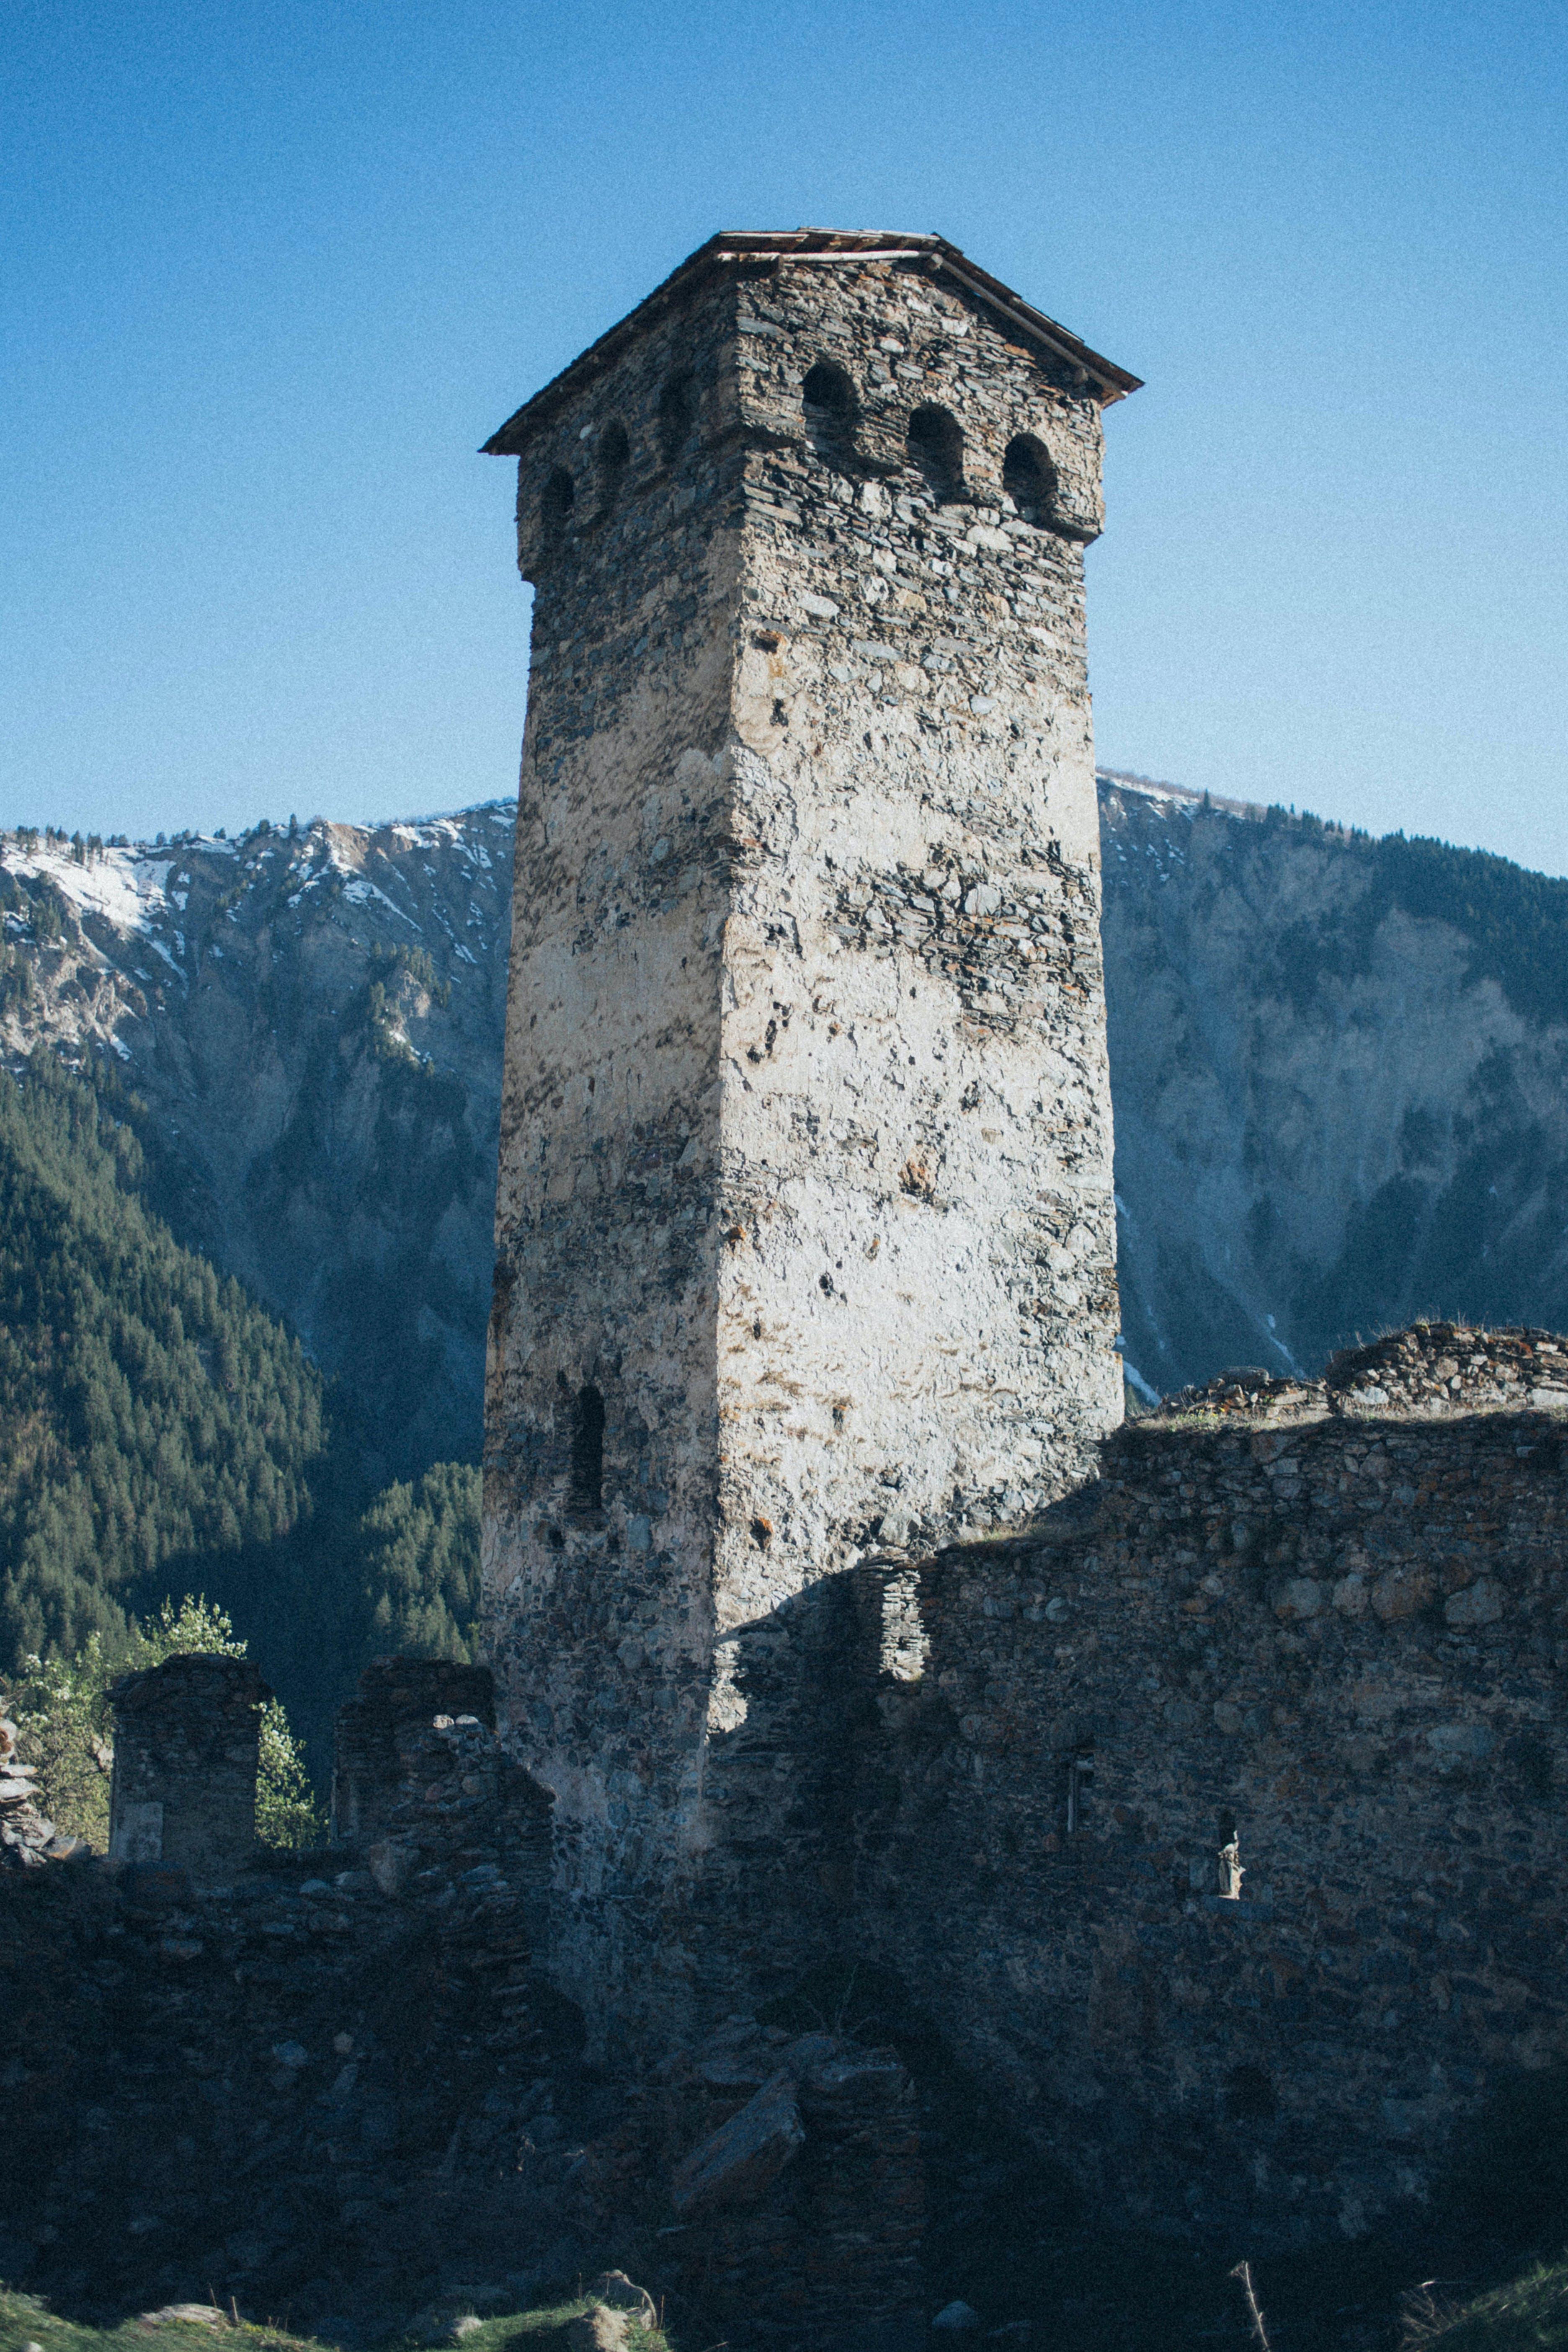 Fotos de stock gratuitas de arquitectura, castillo, cielo, edificio